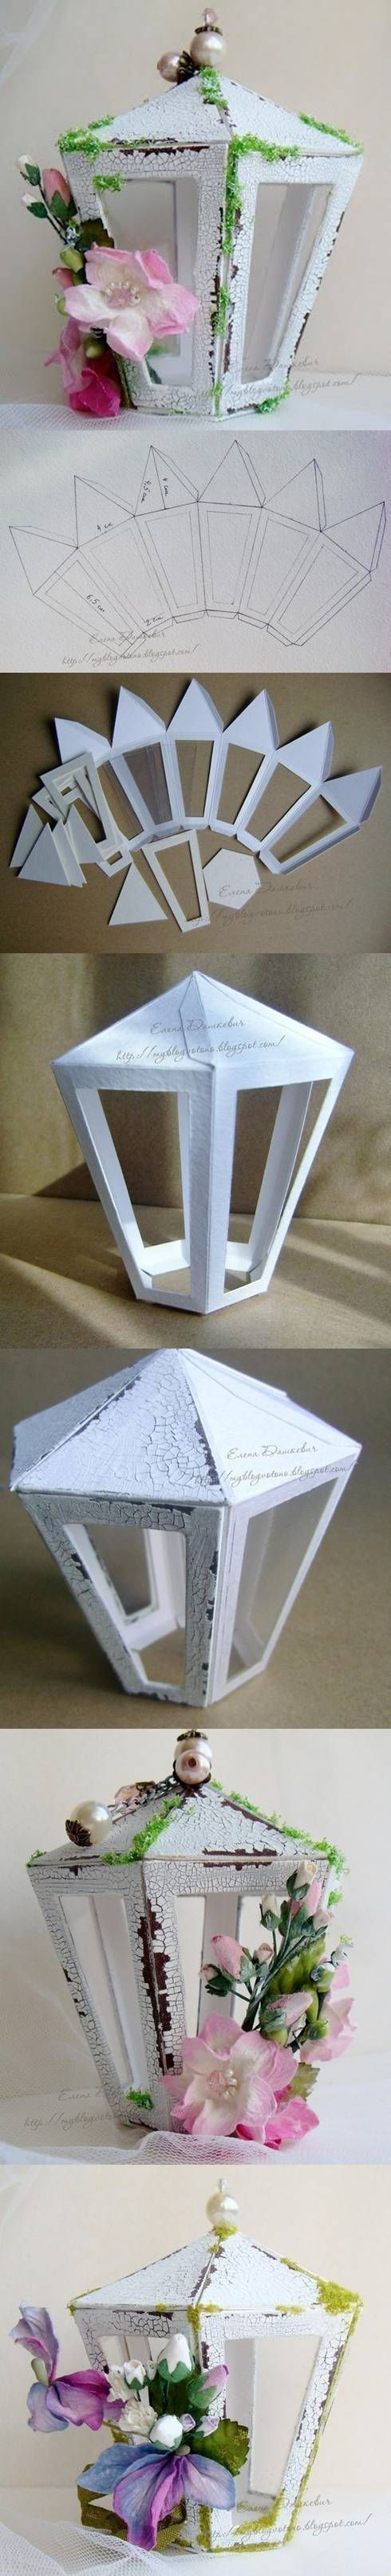 DIY Cardboard-Lantern includes Template -- paint with crackle paint ... for Cardboard Lantern Template  535wja